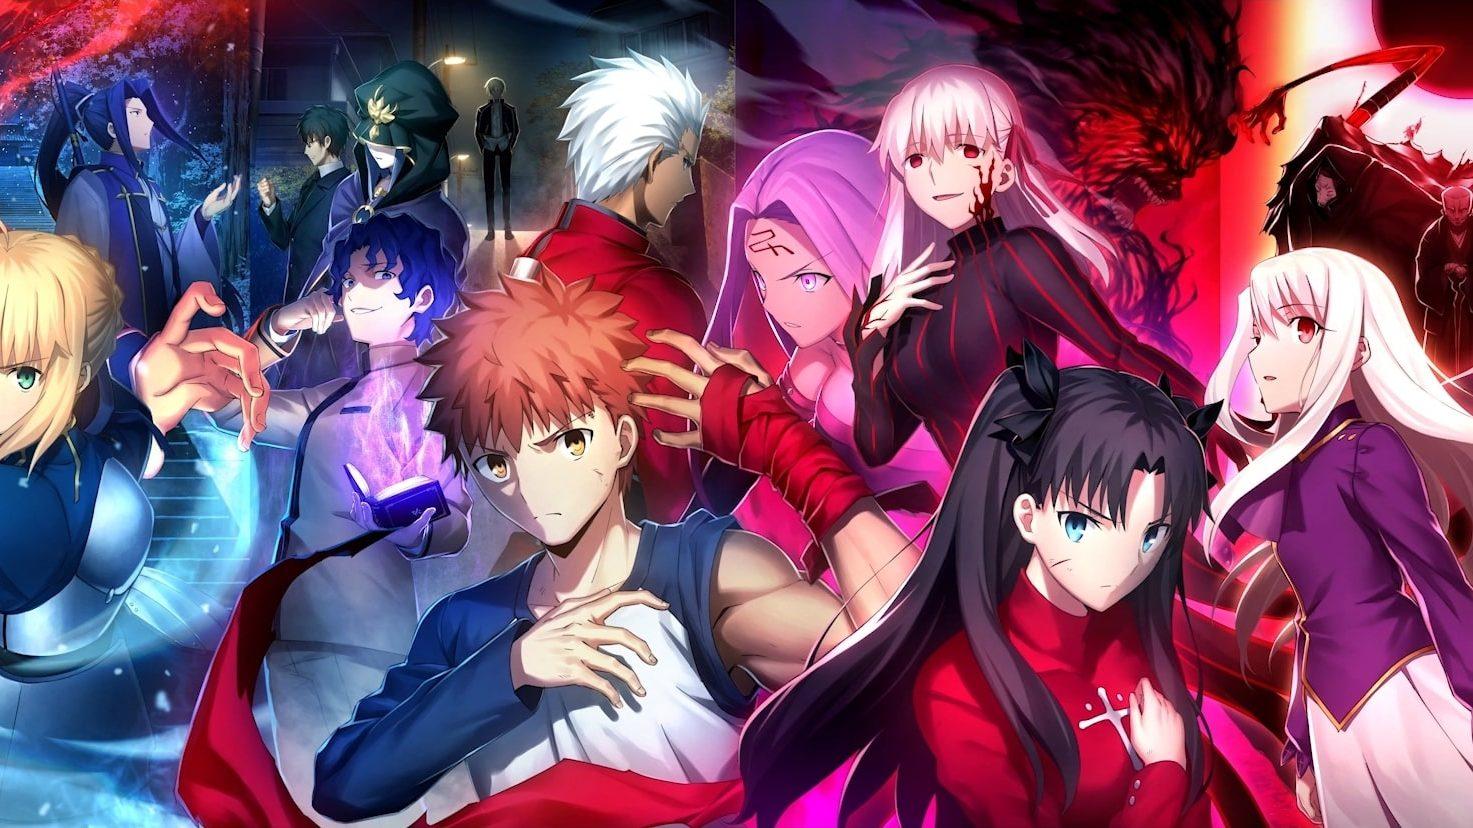 Fate/Stay Night: Heavens Feel III